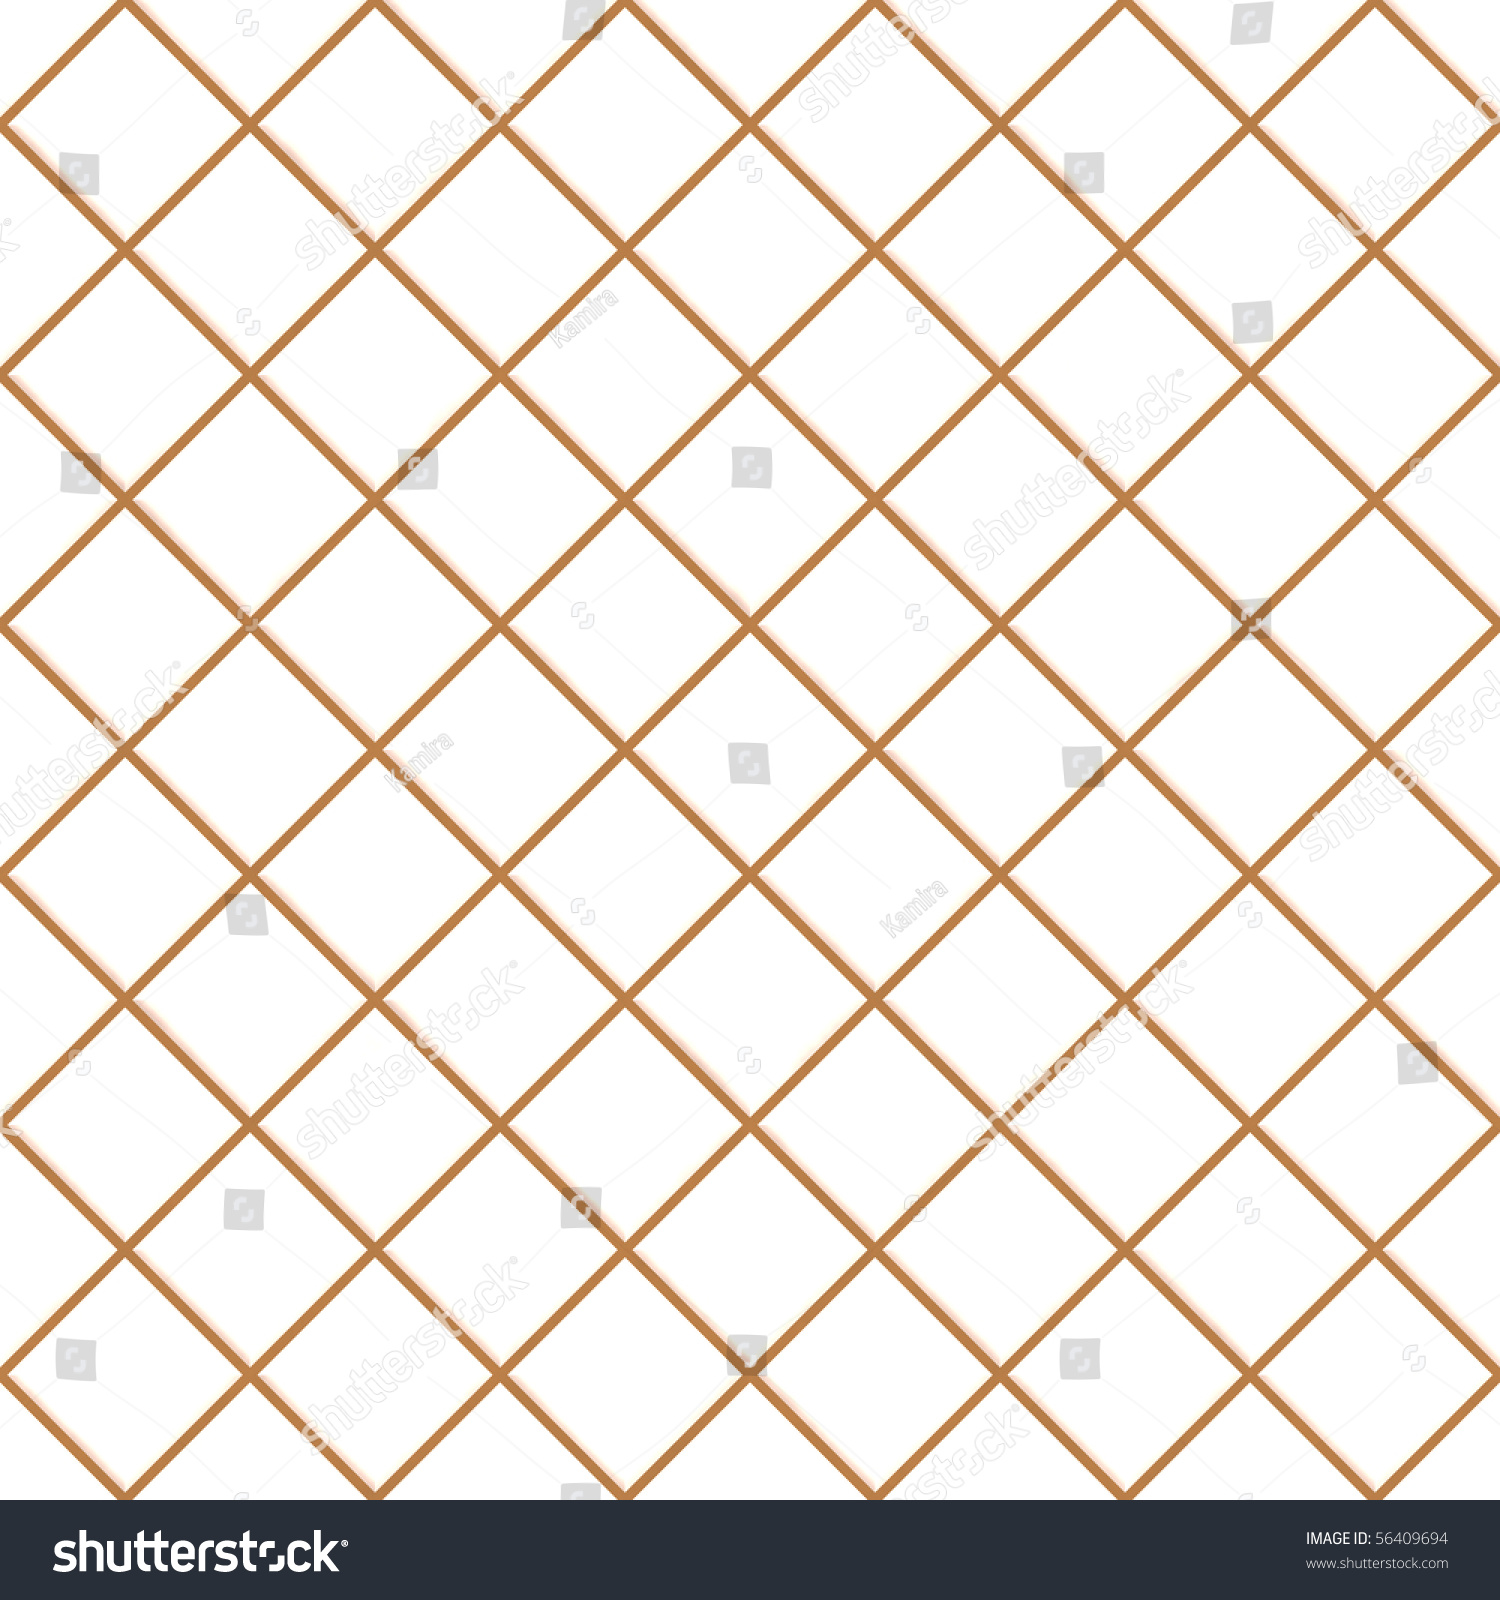 kitchen tiles texture. Seamless White Tiles Texture Background Kitchen Stock Illustration 56409694 - Shutterstock I